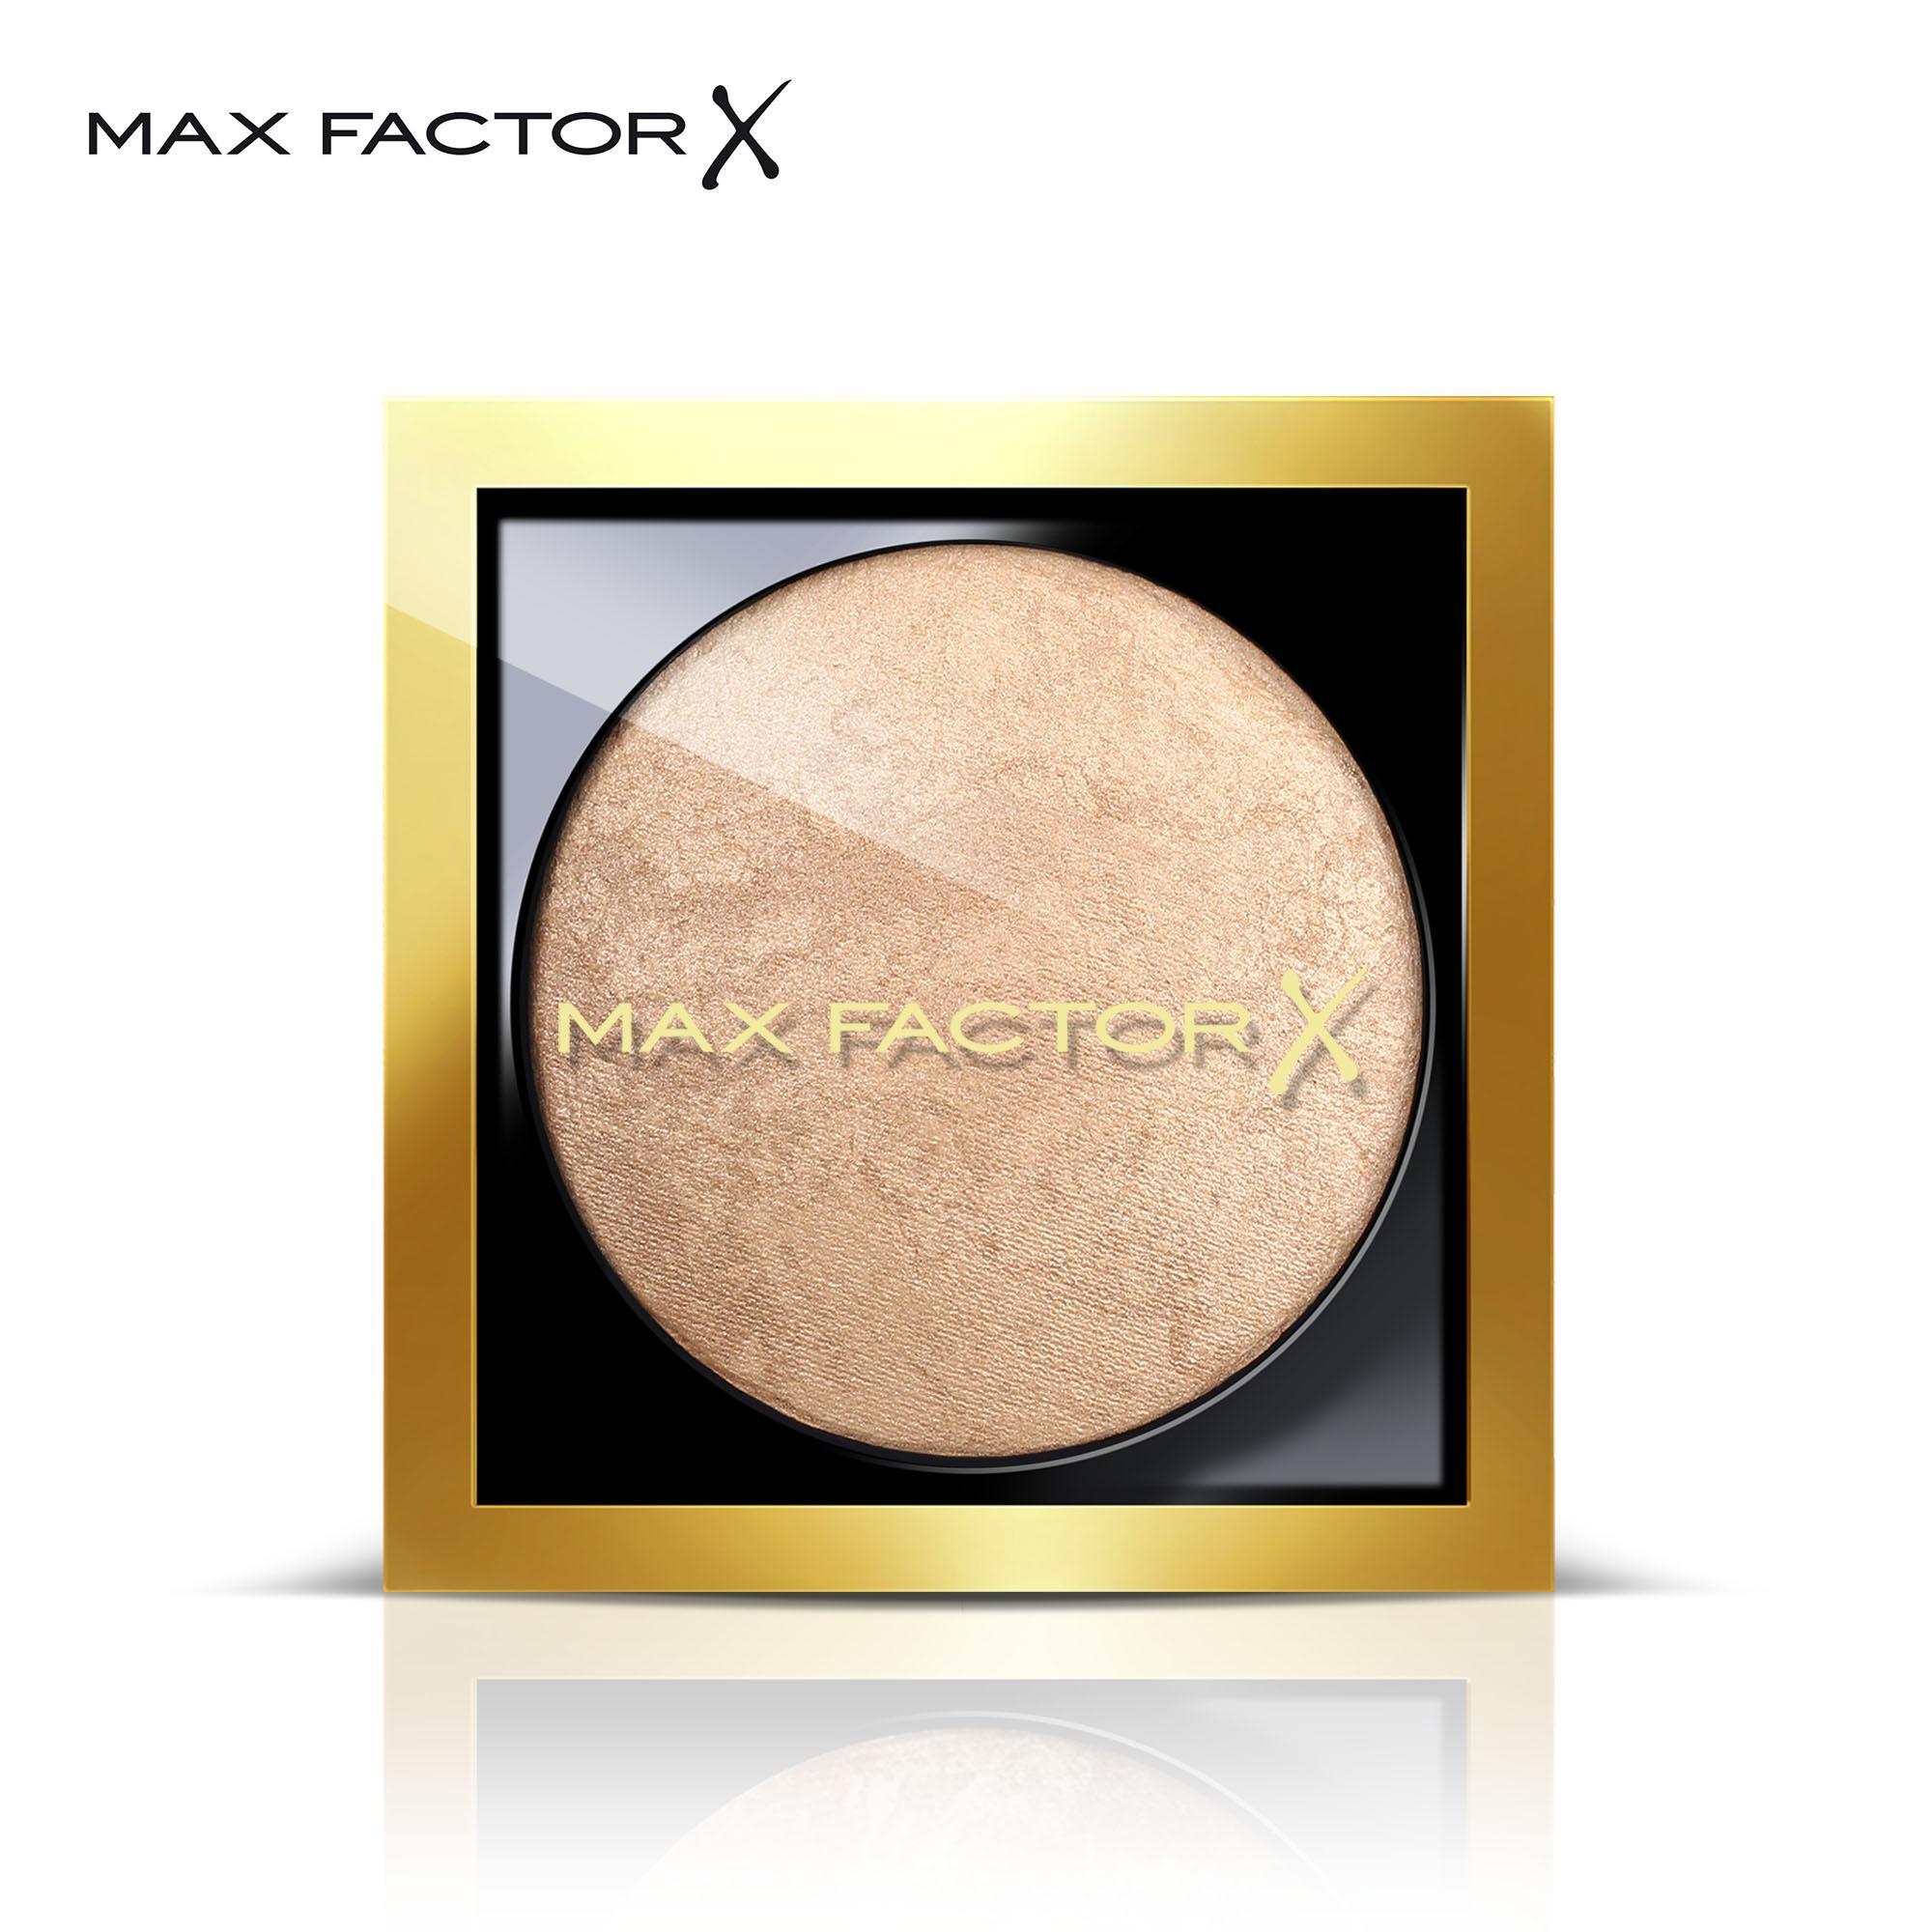 Max Factor Crème Bronzer Philippines